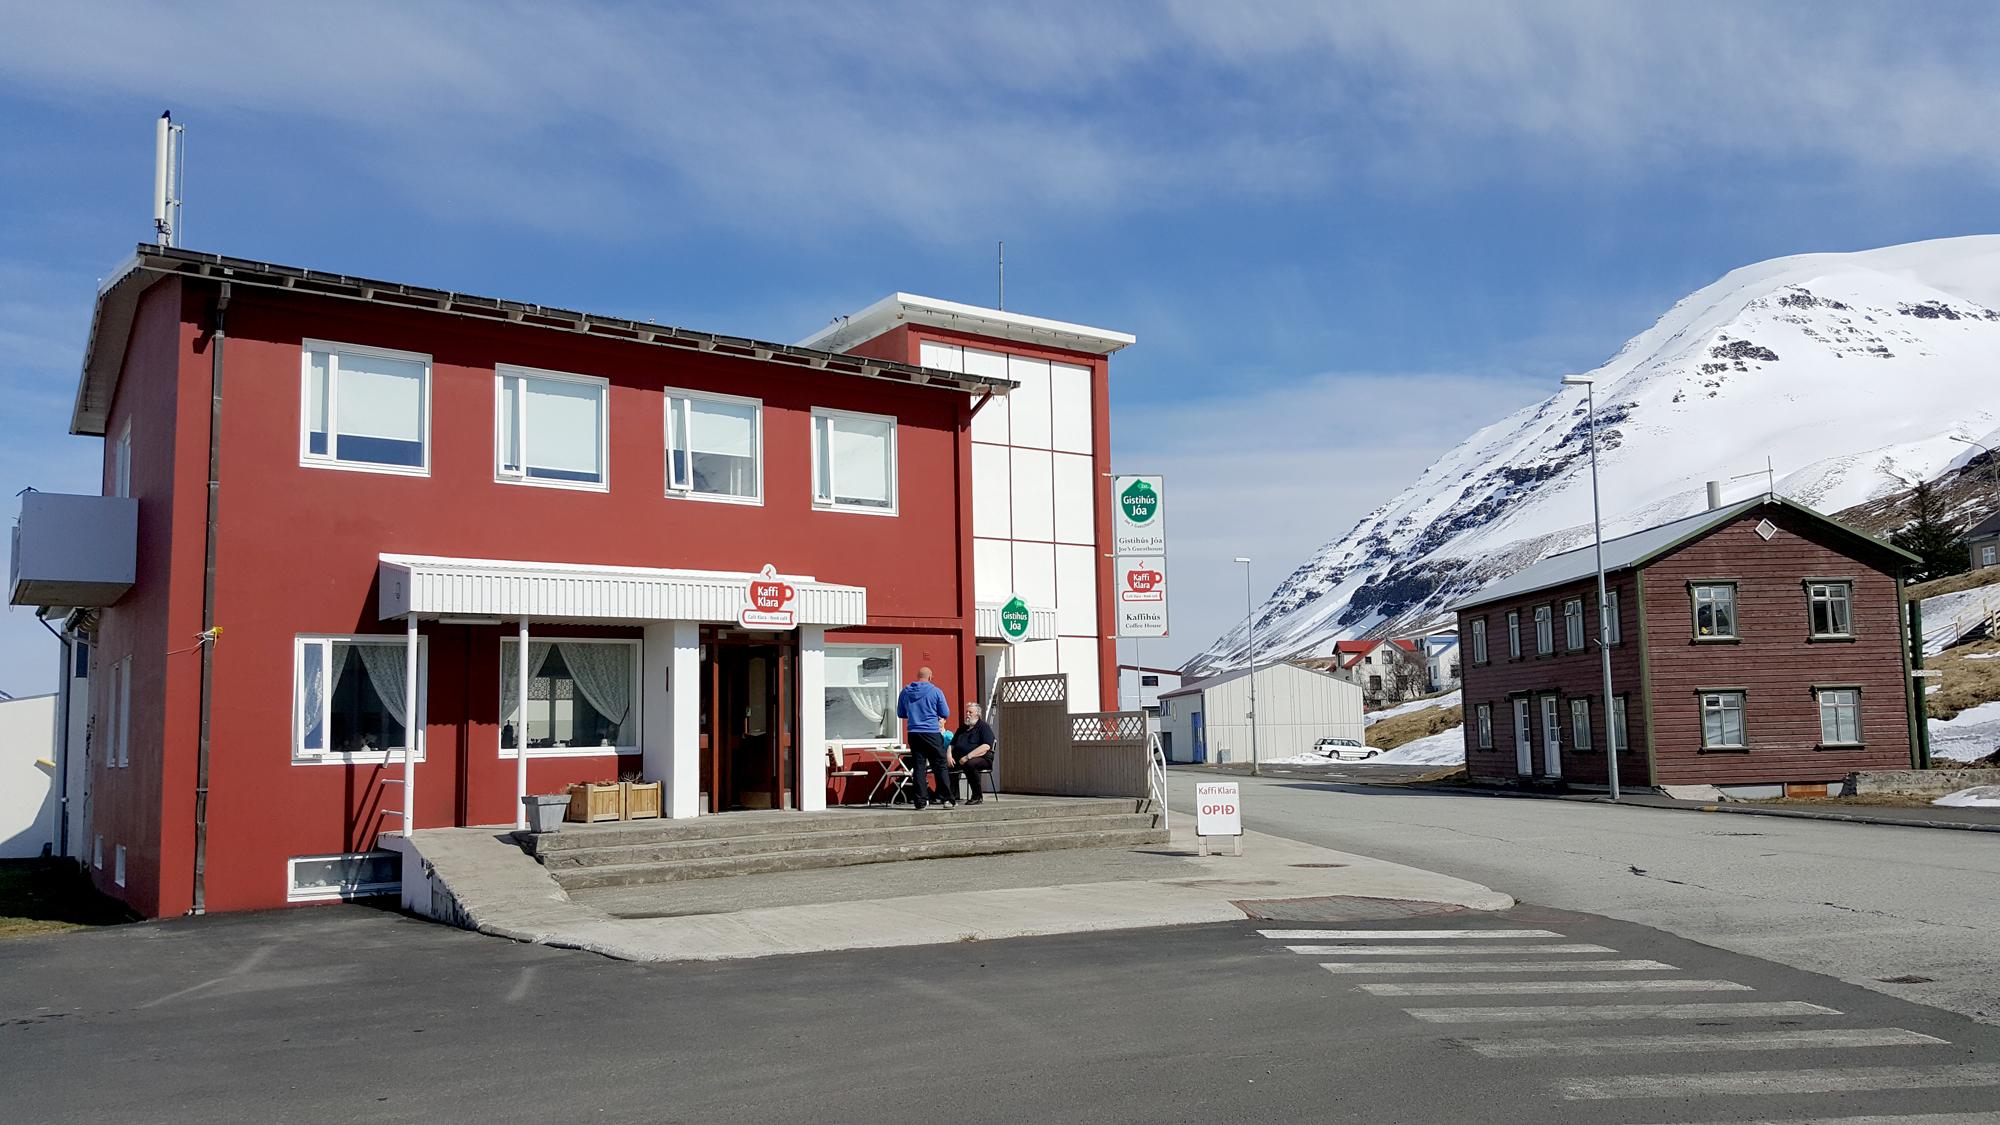 Guesthouse in Ólafsfjörður in North Iceland